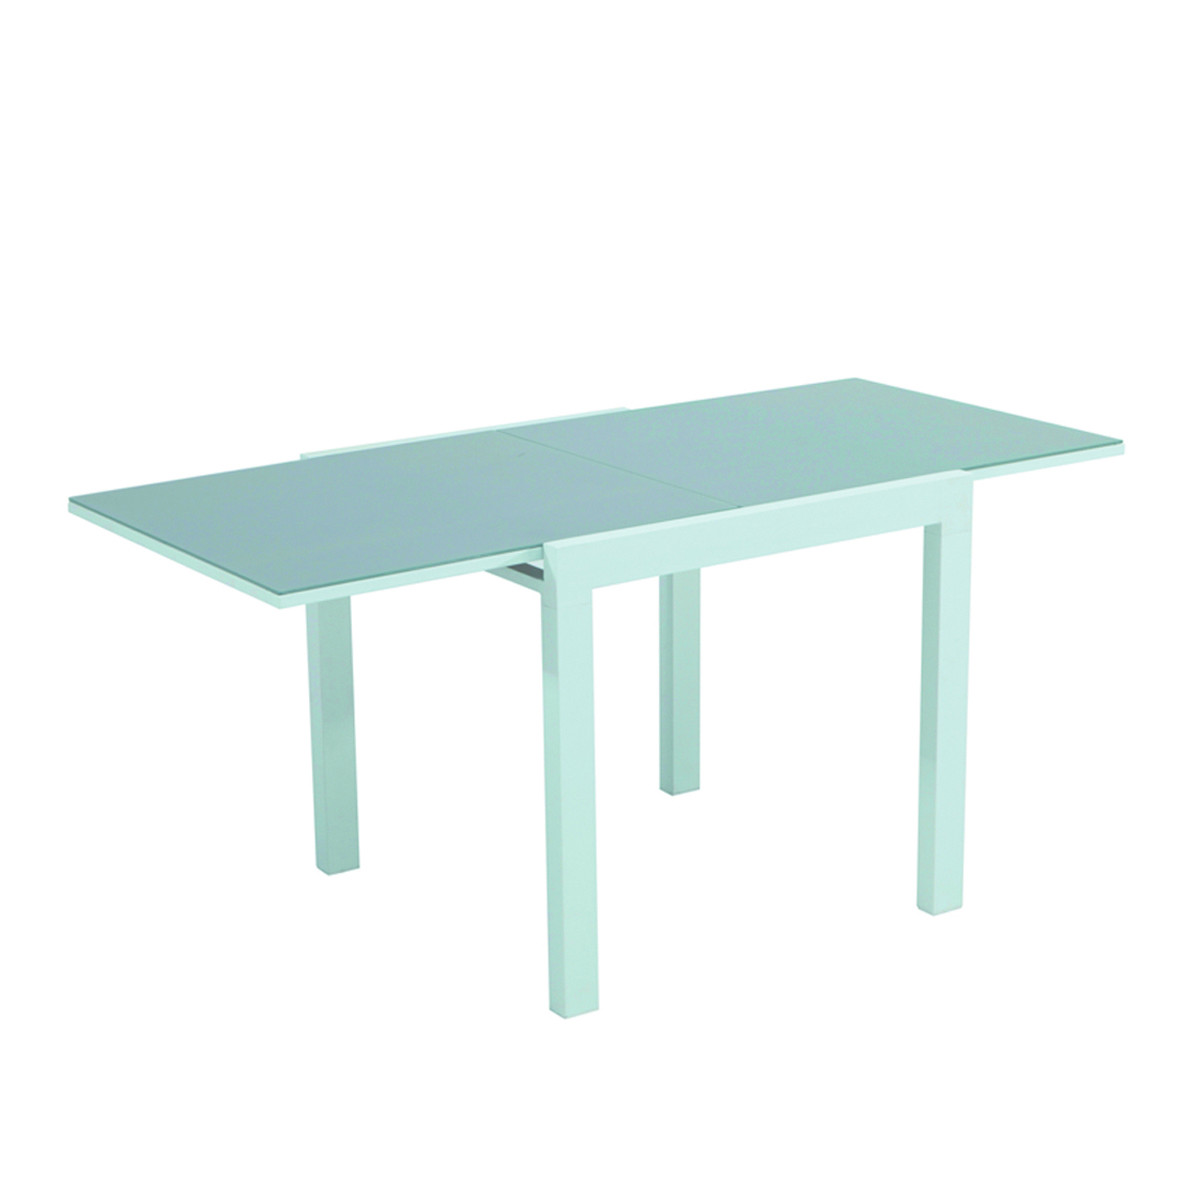 Tavolo fast allungabile 80 140cm struttura metallo vetro for Tavolo giardino metallo